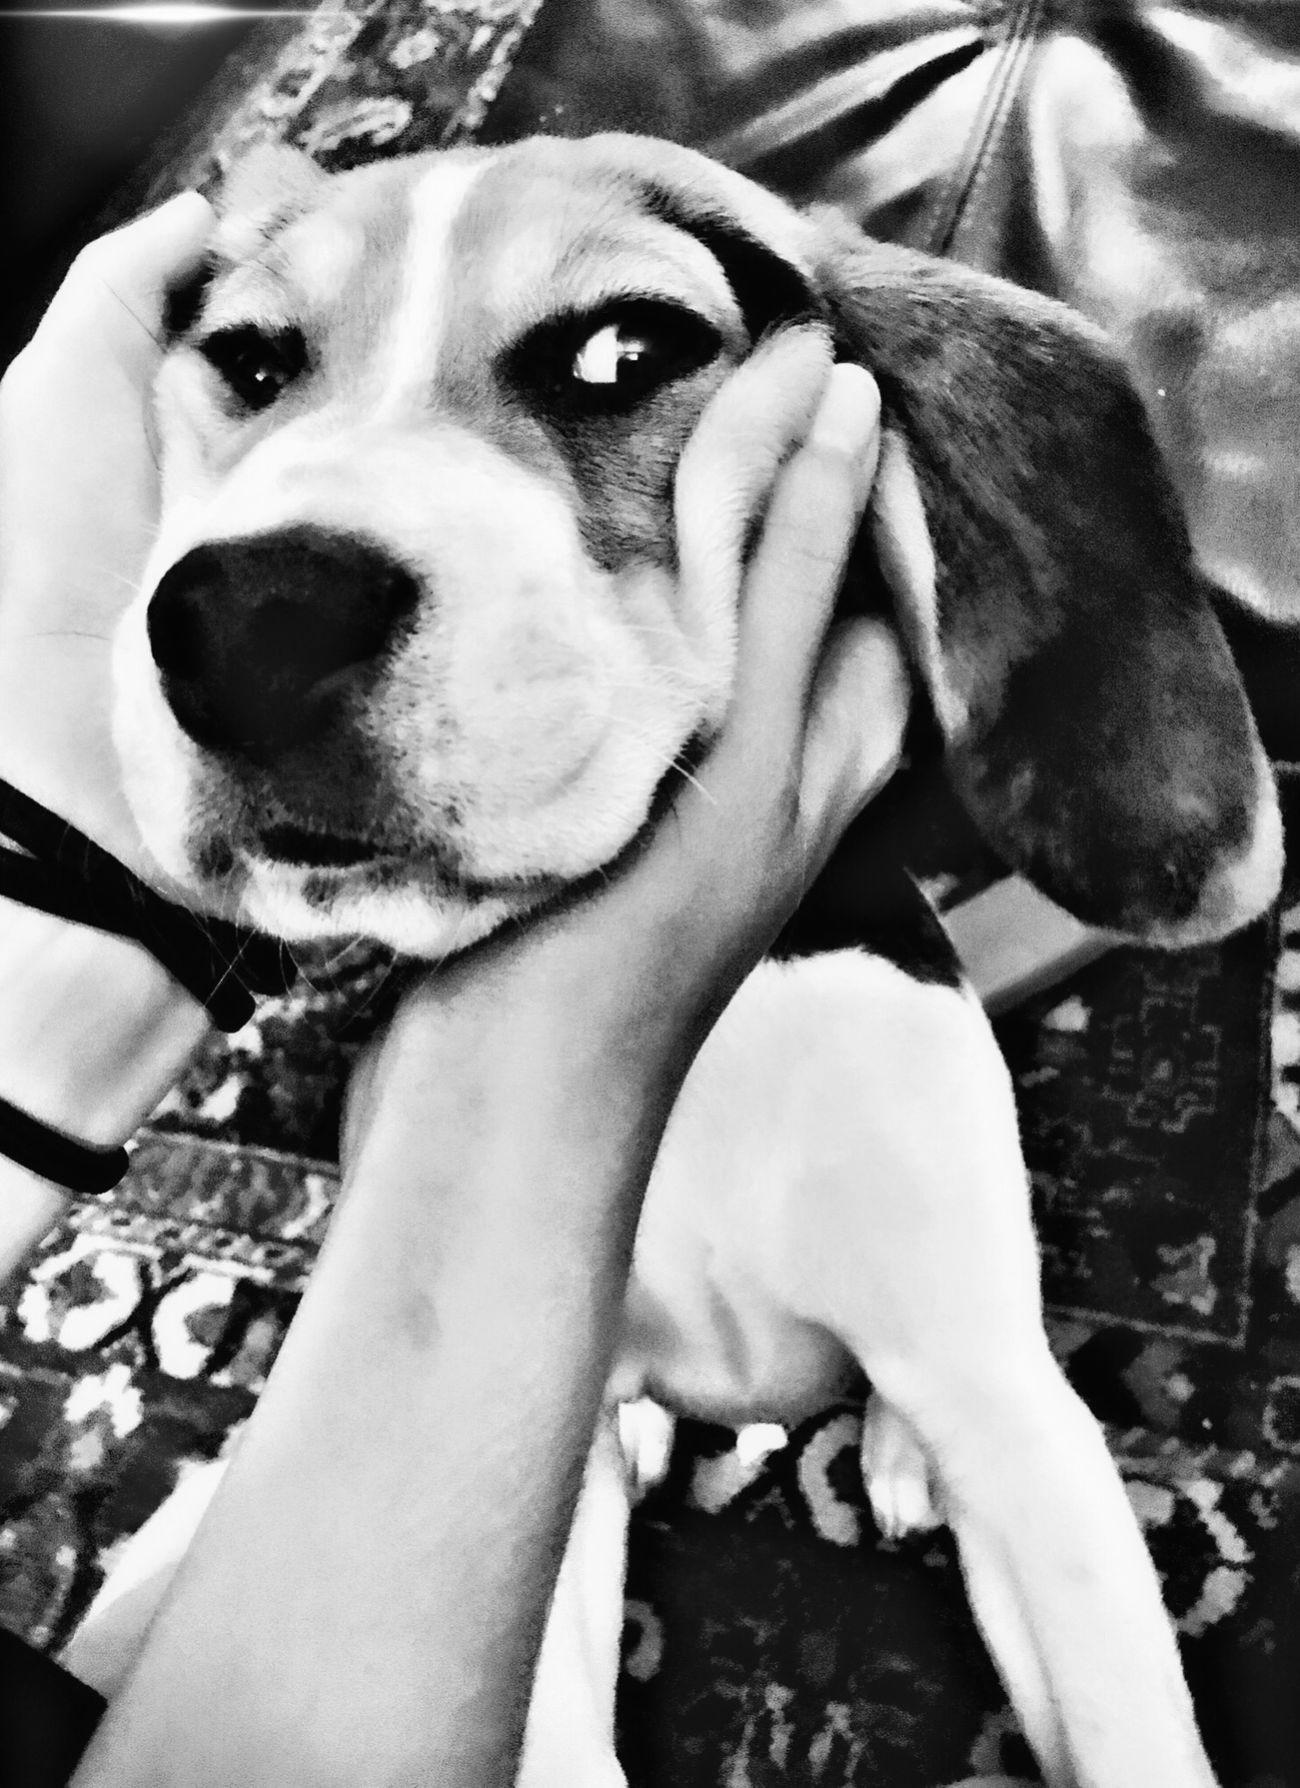 Animal Themes Beagle Beagle Love Beaglelife Beaglelove Beaglelovers Beaglemania Beagleoftheday Beaglepuppy Beagles  Beagleselfy Beaglestagram Beagleworld Black Blackandwhite Close-up Dog Dog Love Dogs Dogslife Dog❤ Domestic Animals Human Hand One Animal Pets